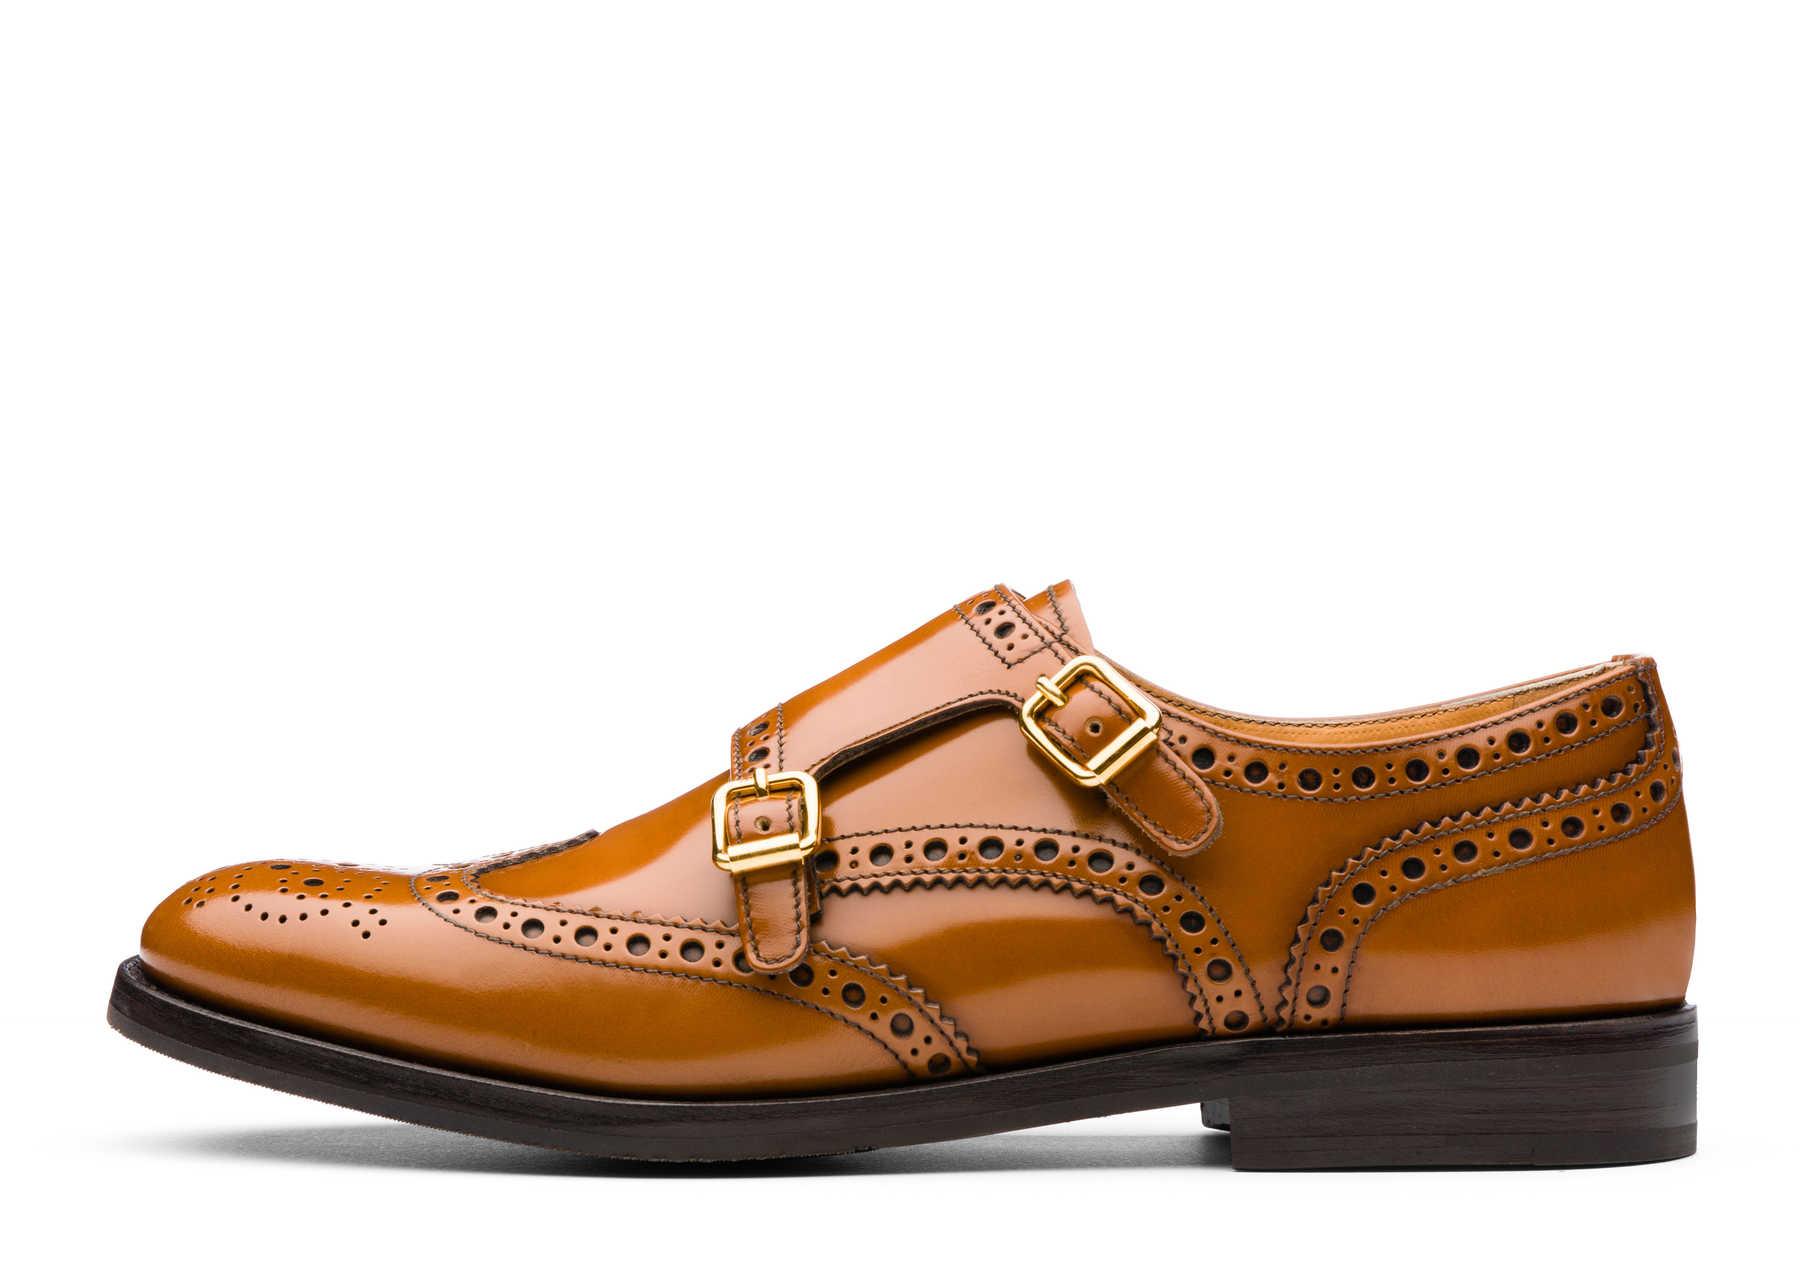 church shoes lana r polished binder UGUBVGK